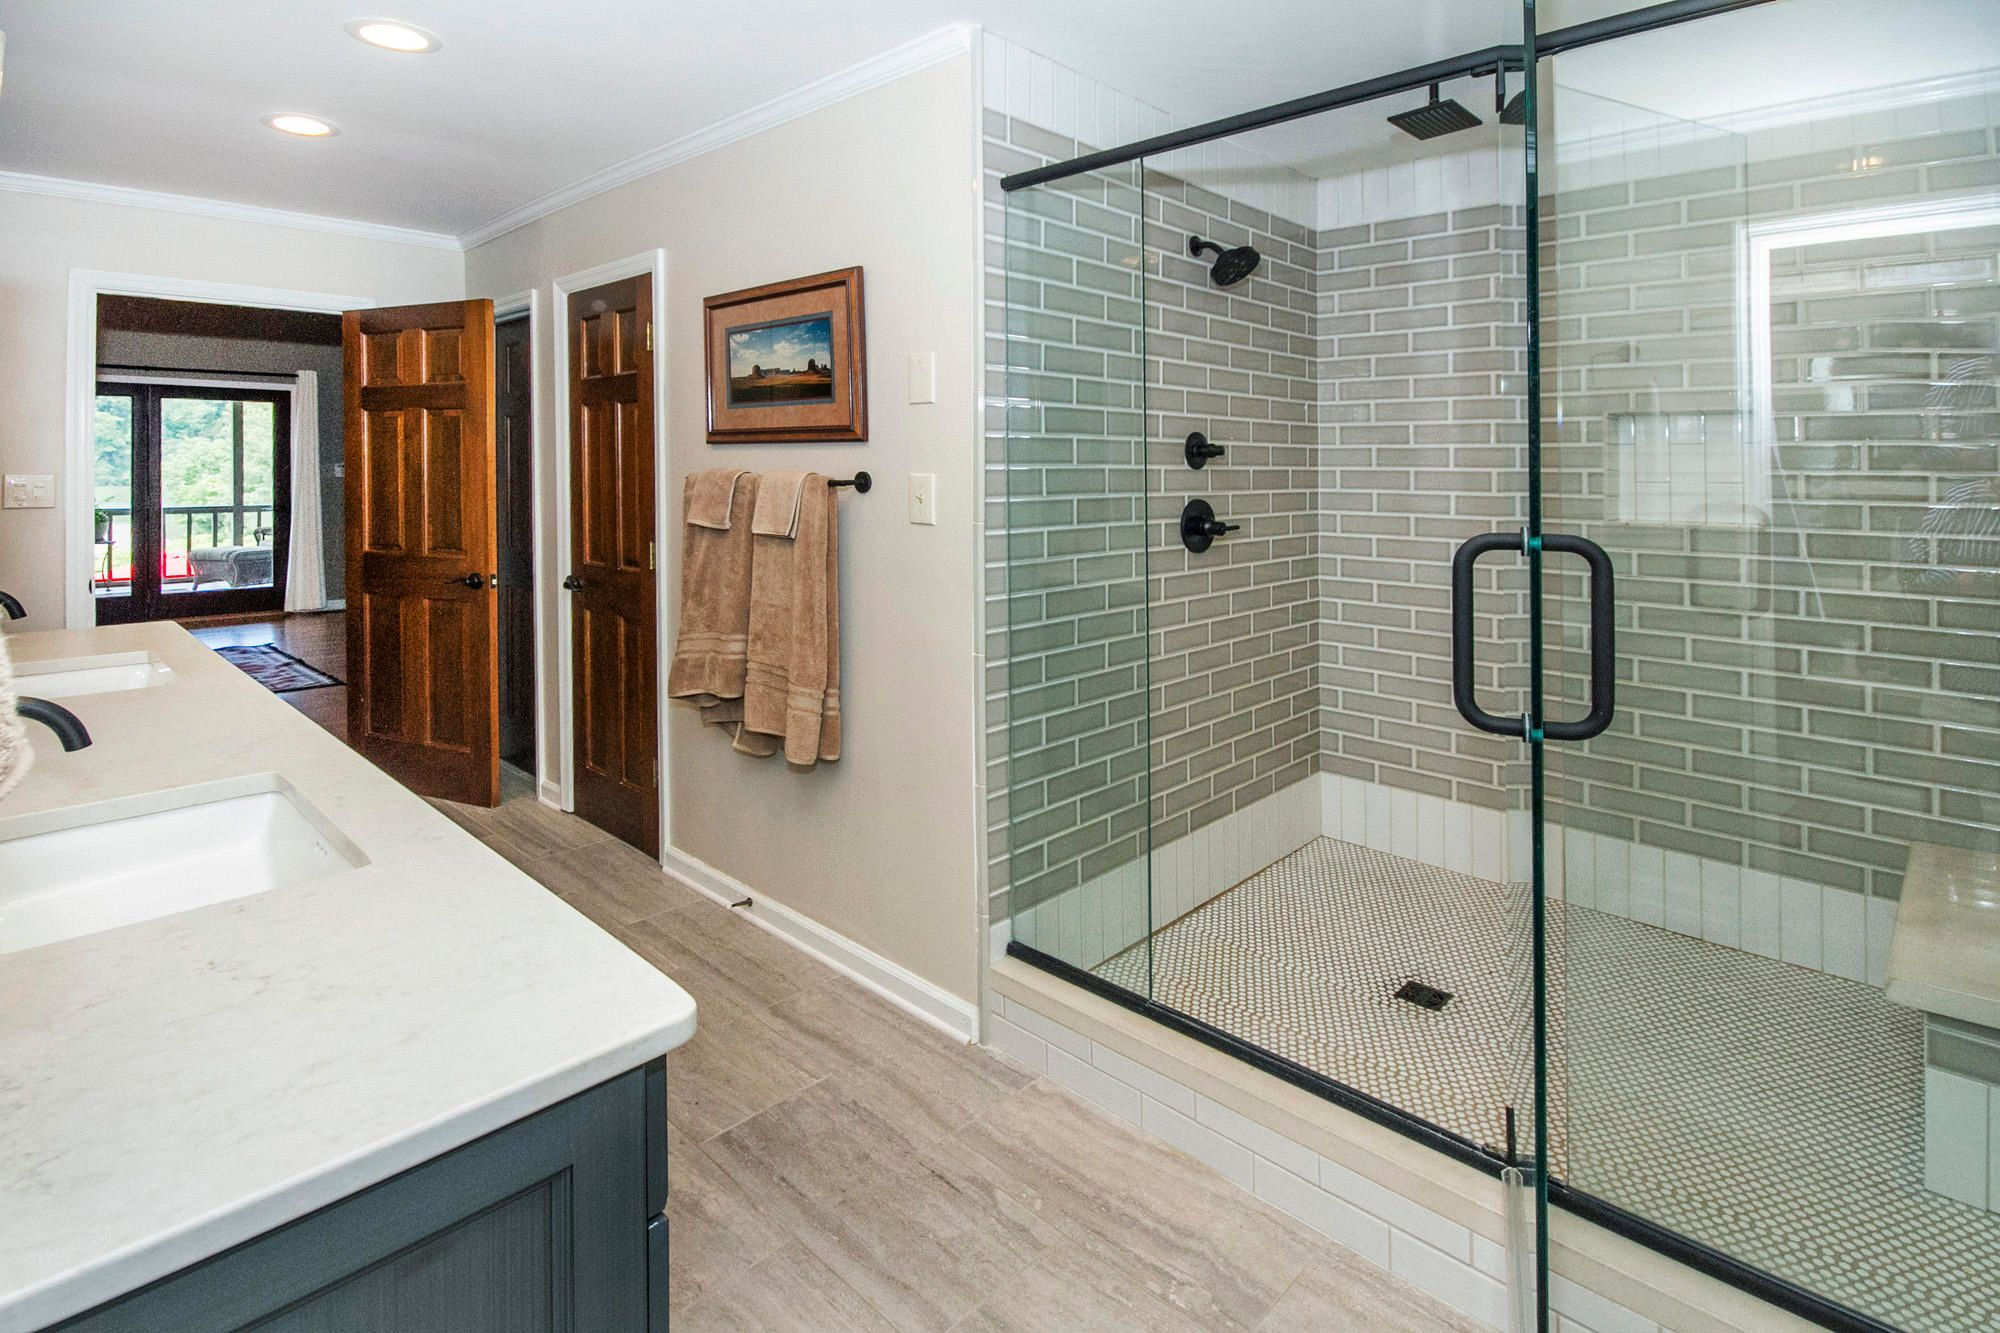 Beautiful large tile shower